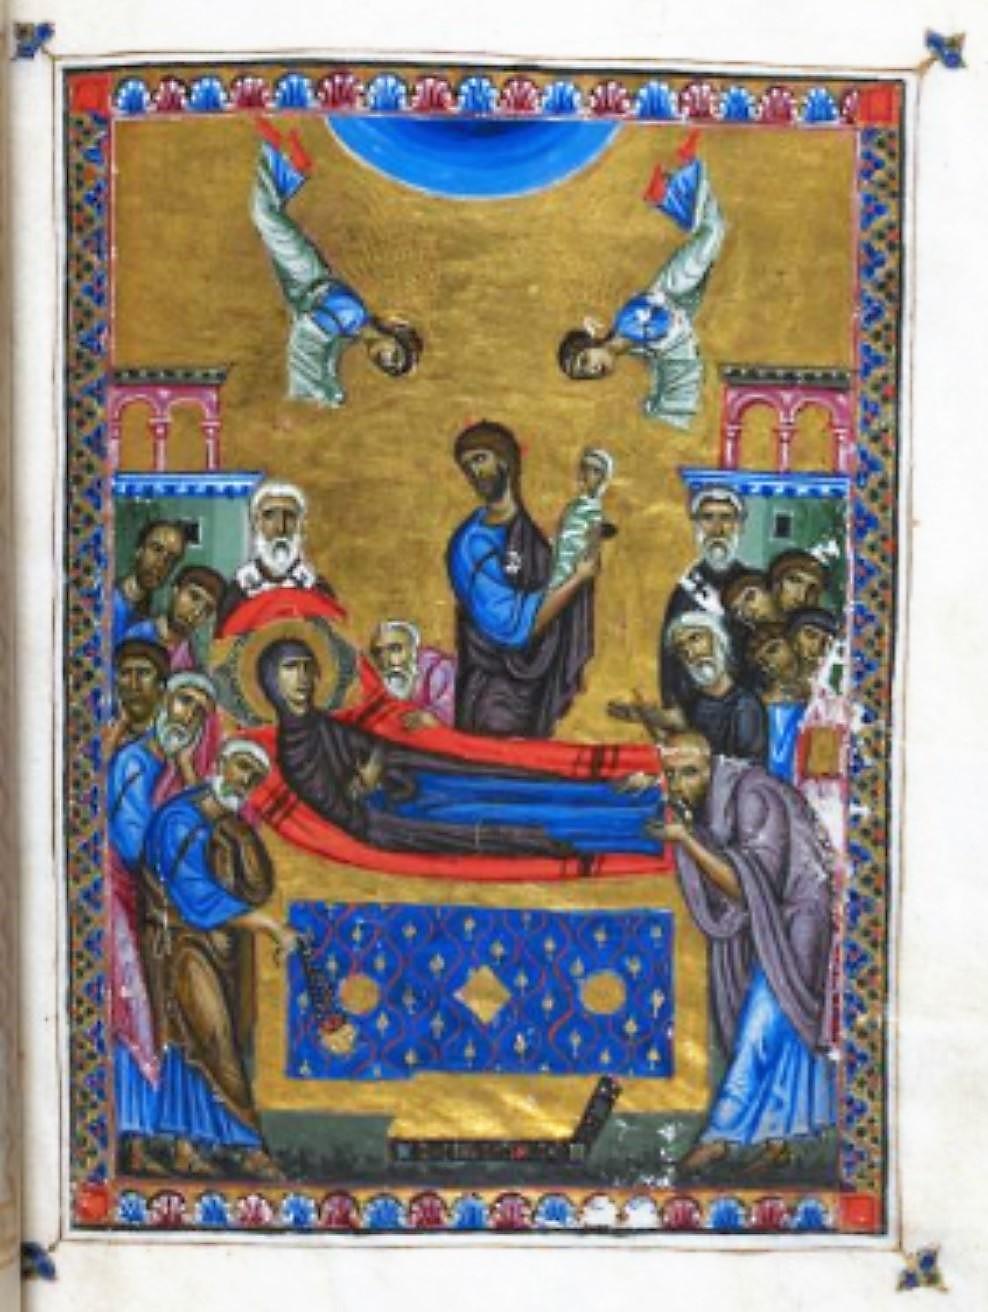 Mort de Marie 1131–43 Melisende Psalter, , BL Egerton MS 1139 fol 12 ar